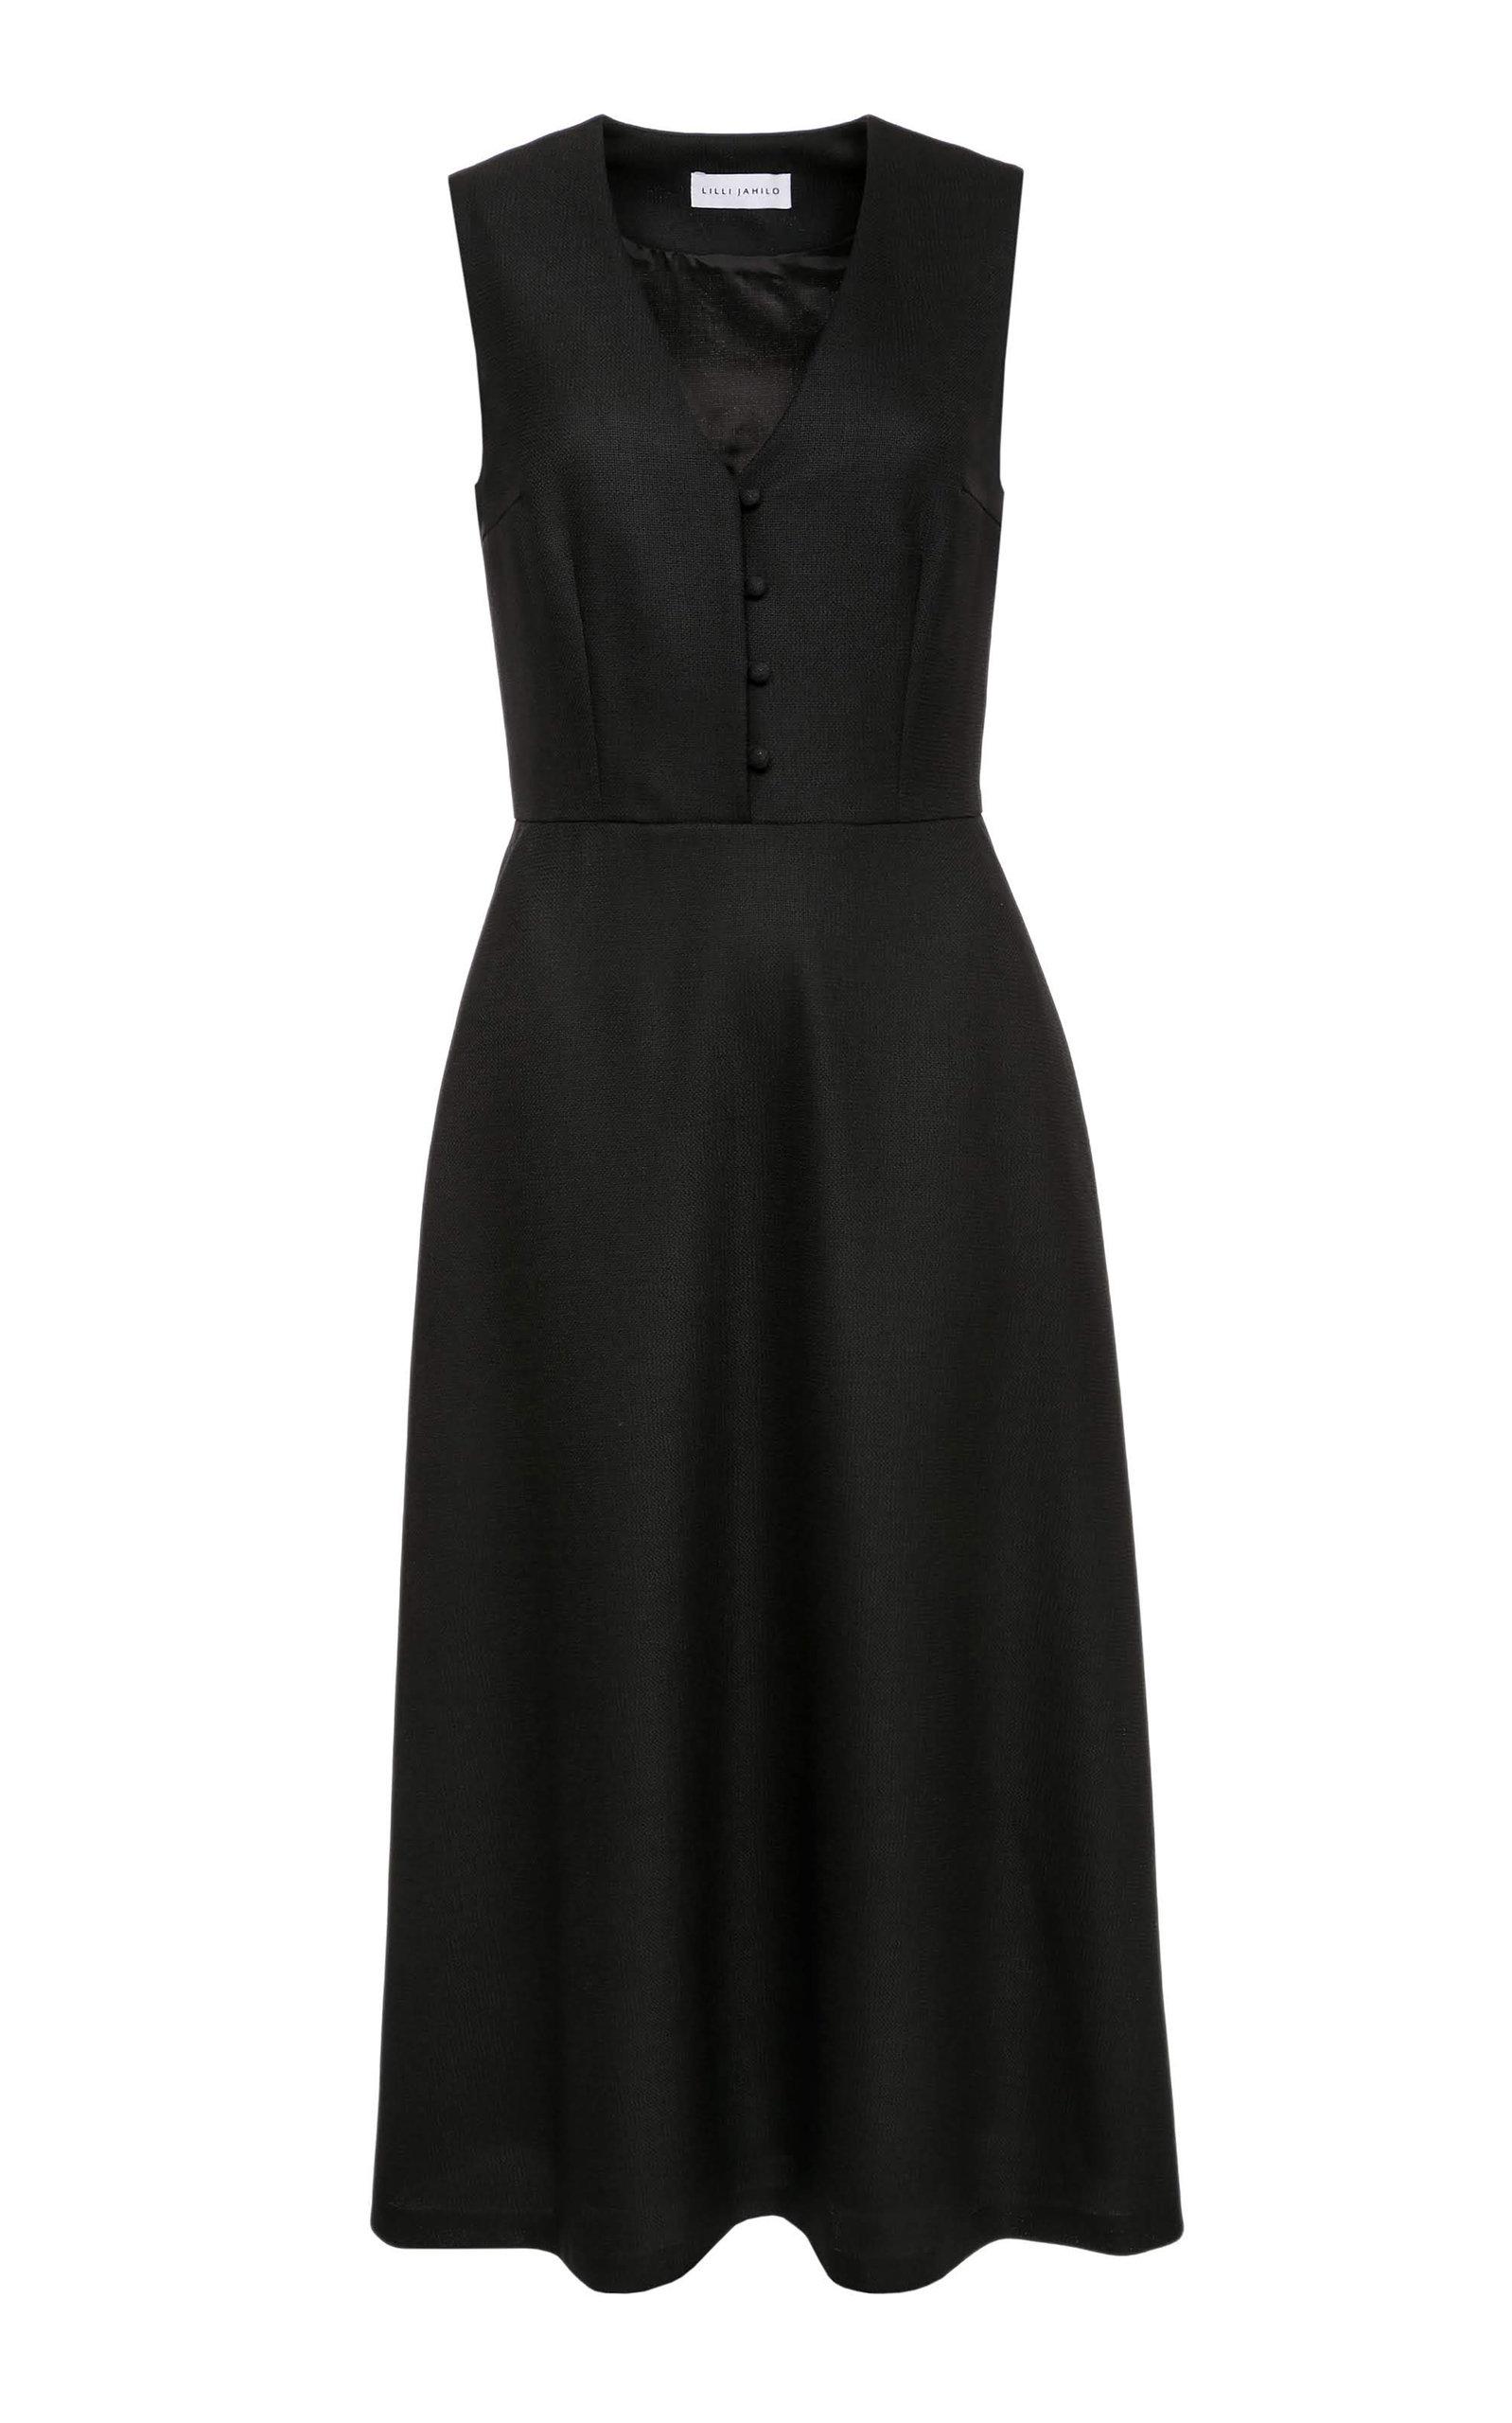 841b8b2bffefb Hedda Wool Vest Dress with Pockets by Lilli Jahilo | Moda Operandi